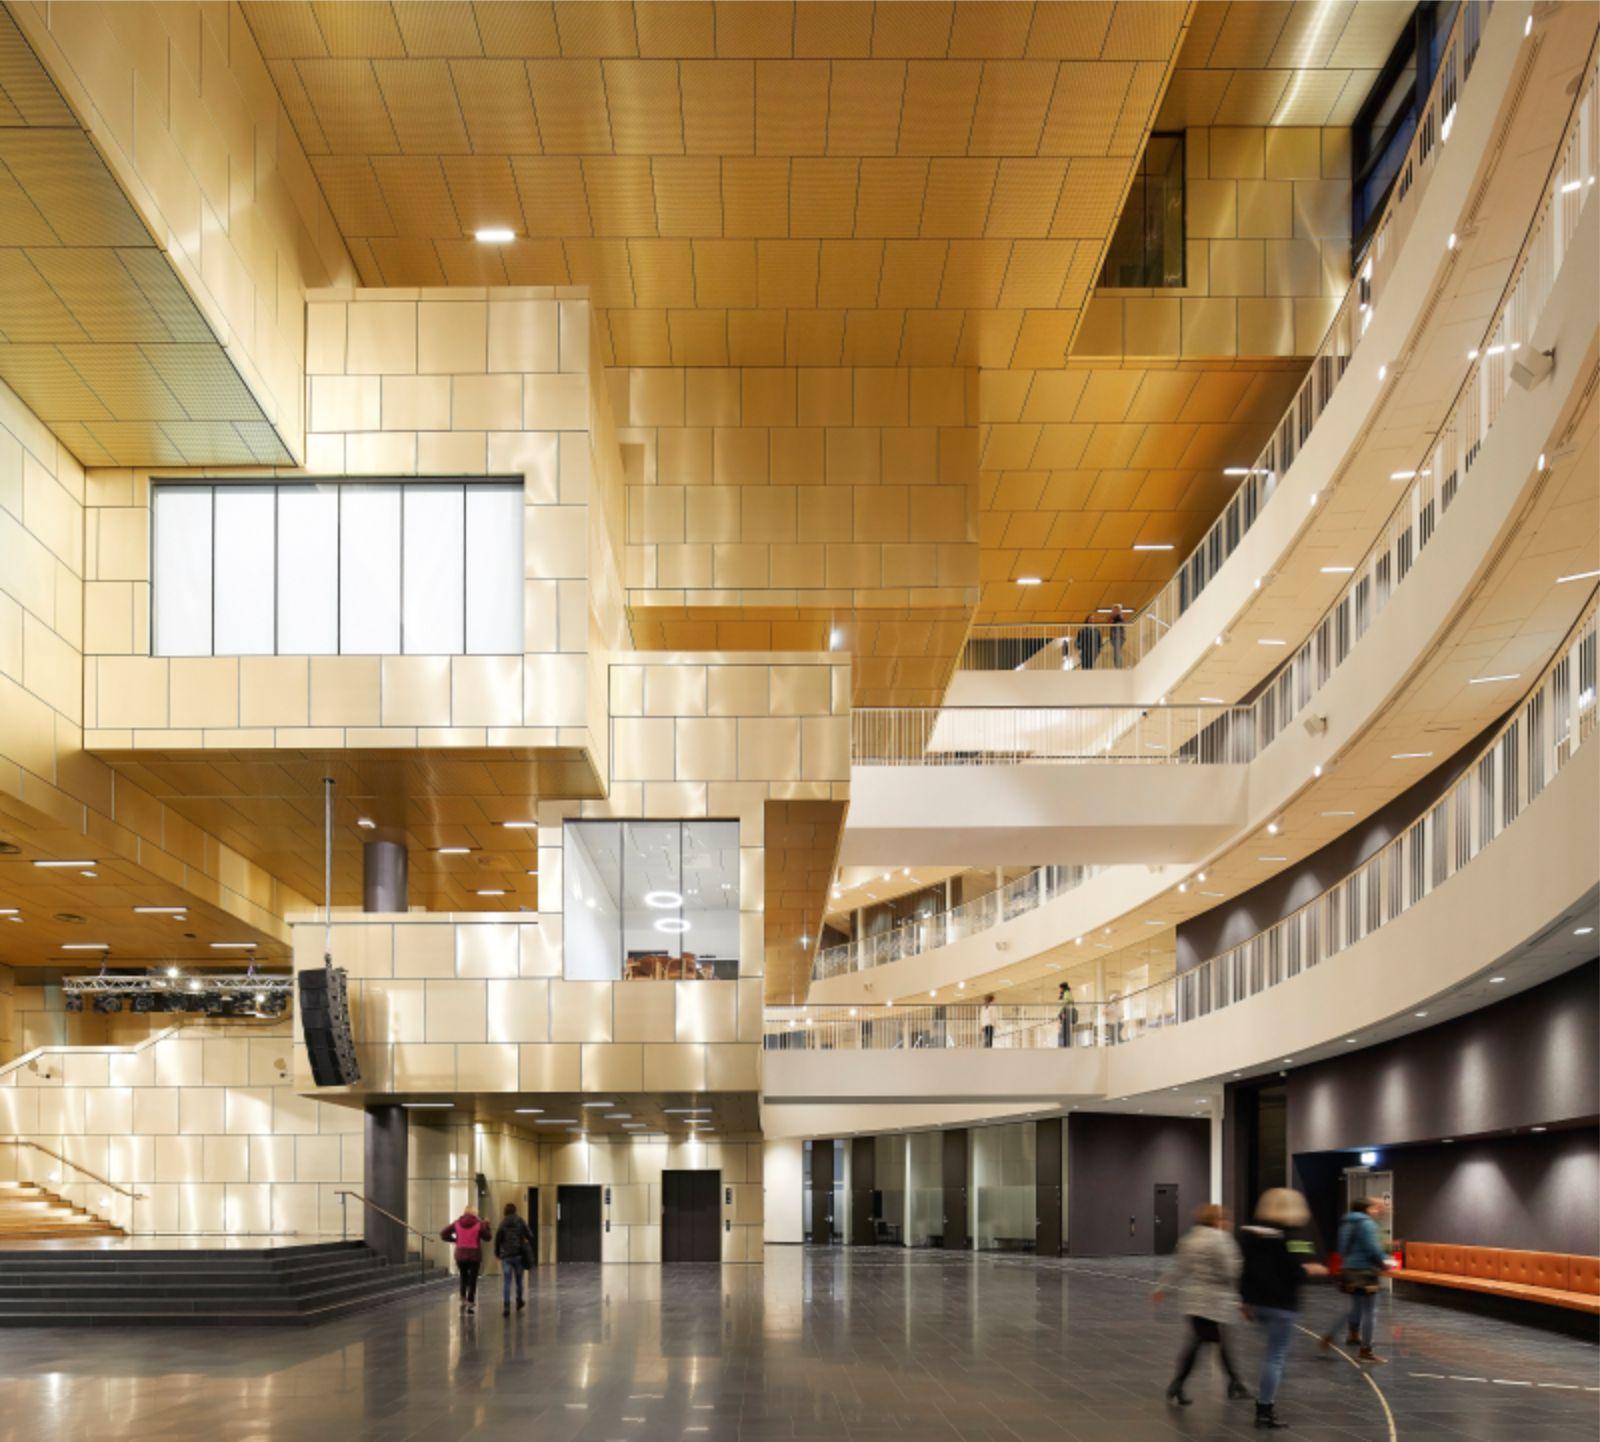 Henning Larsen Prize for Architecture